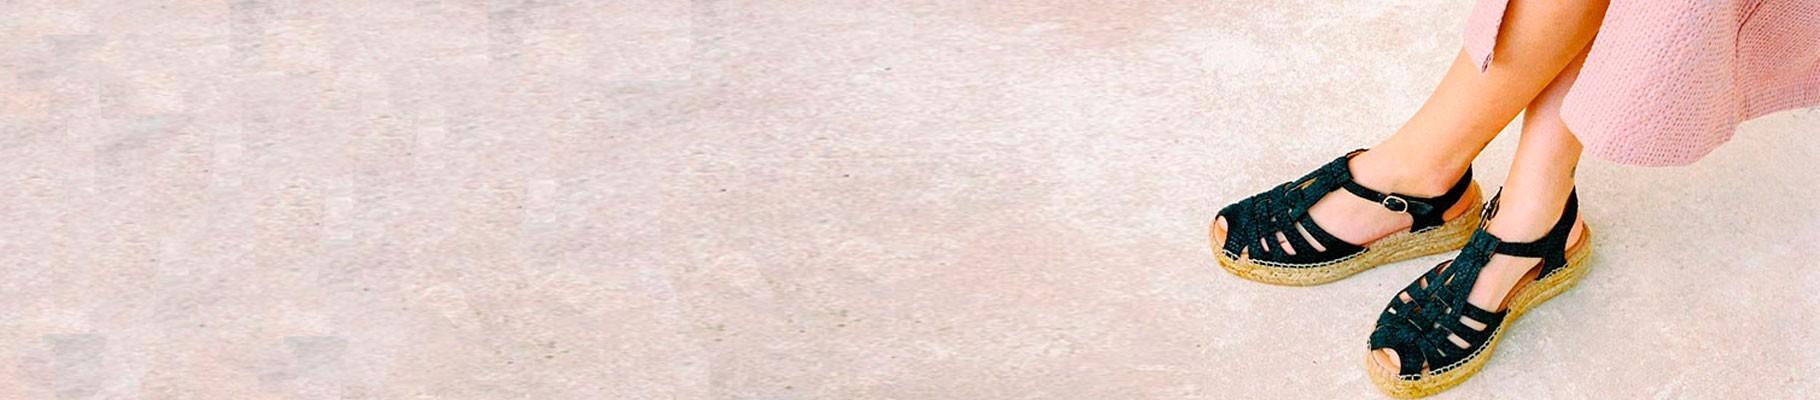 Sandalias para mujer en Suneonline